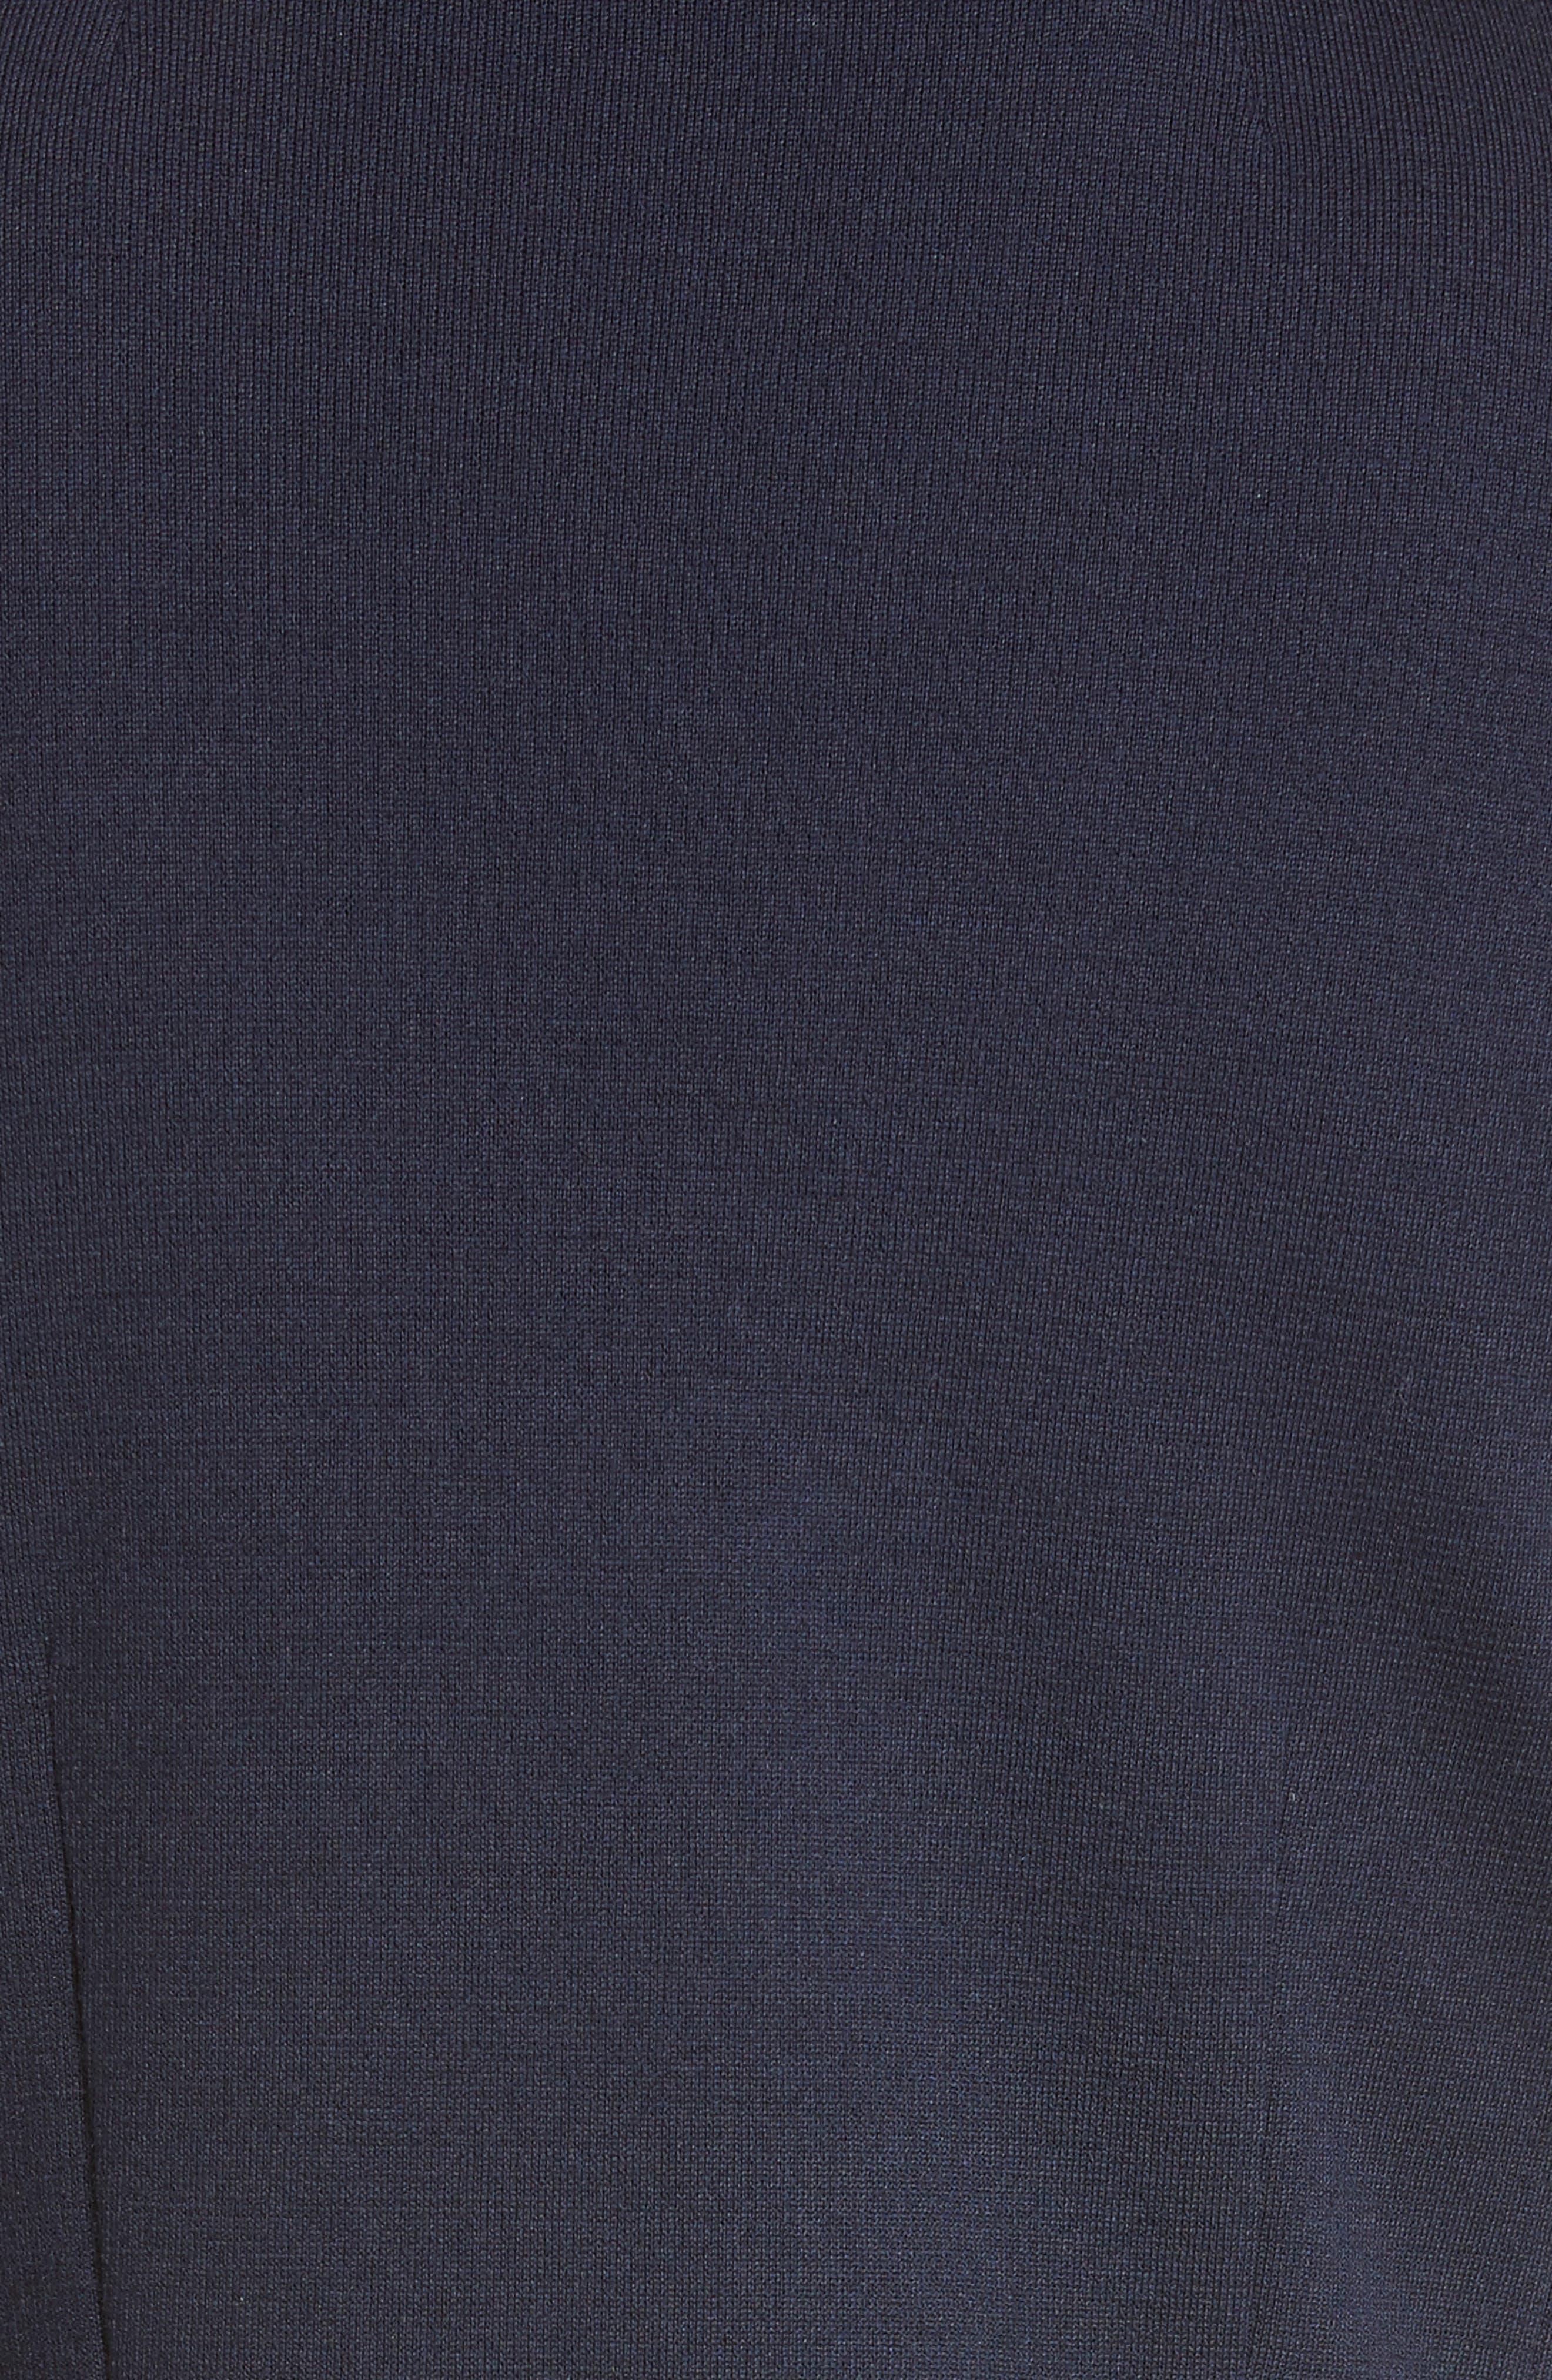 Milano Knit Blazer,                             Alternate thumbnail 7, color,                             410